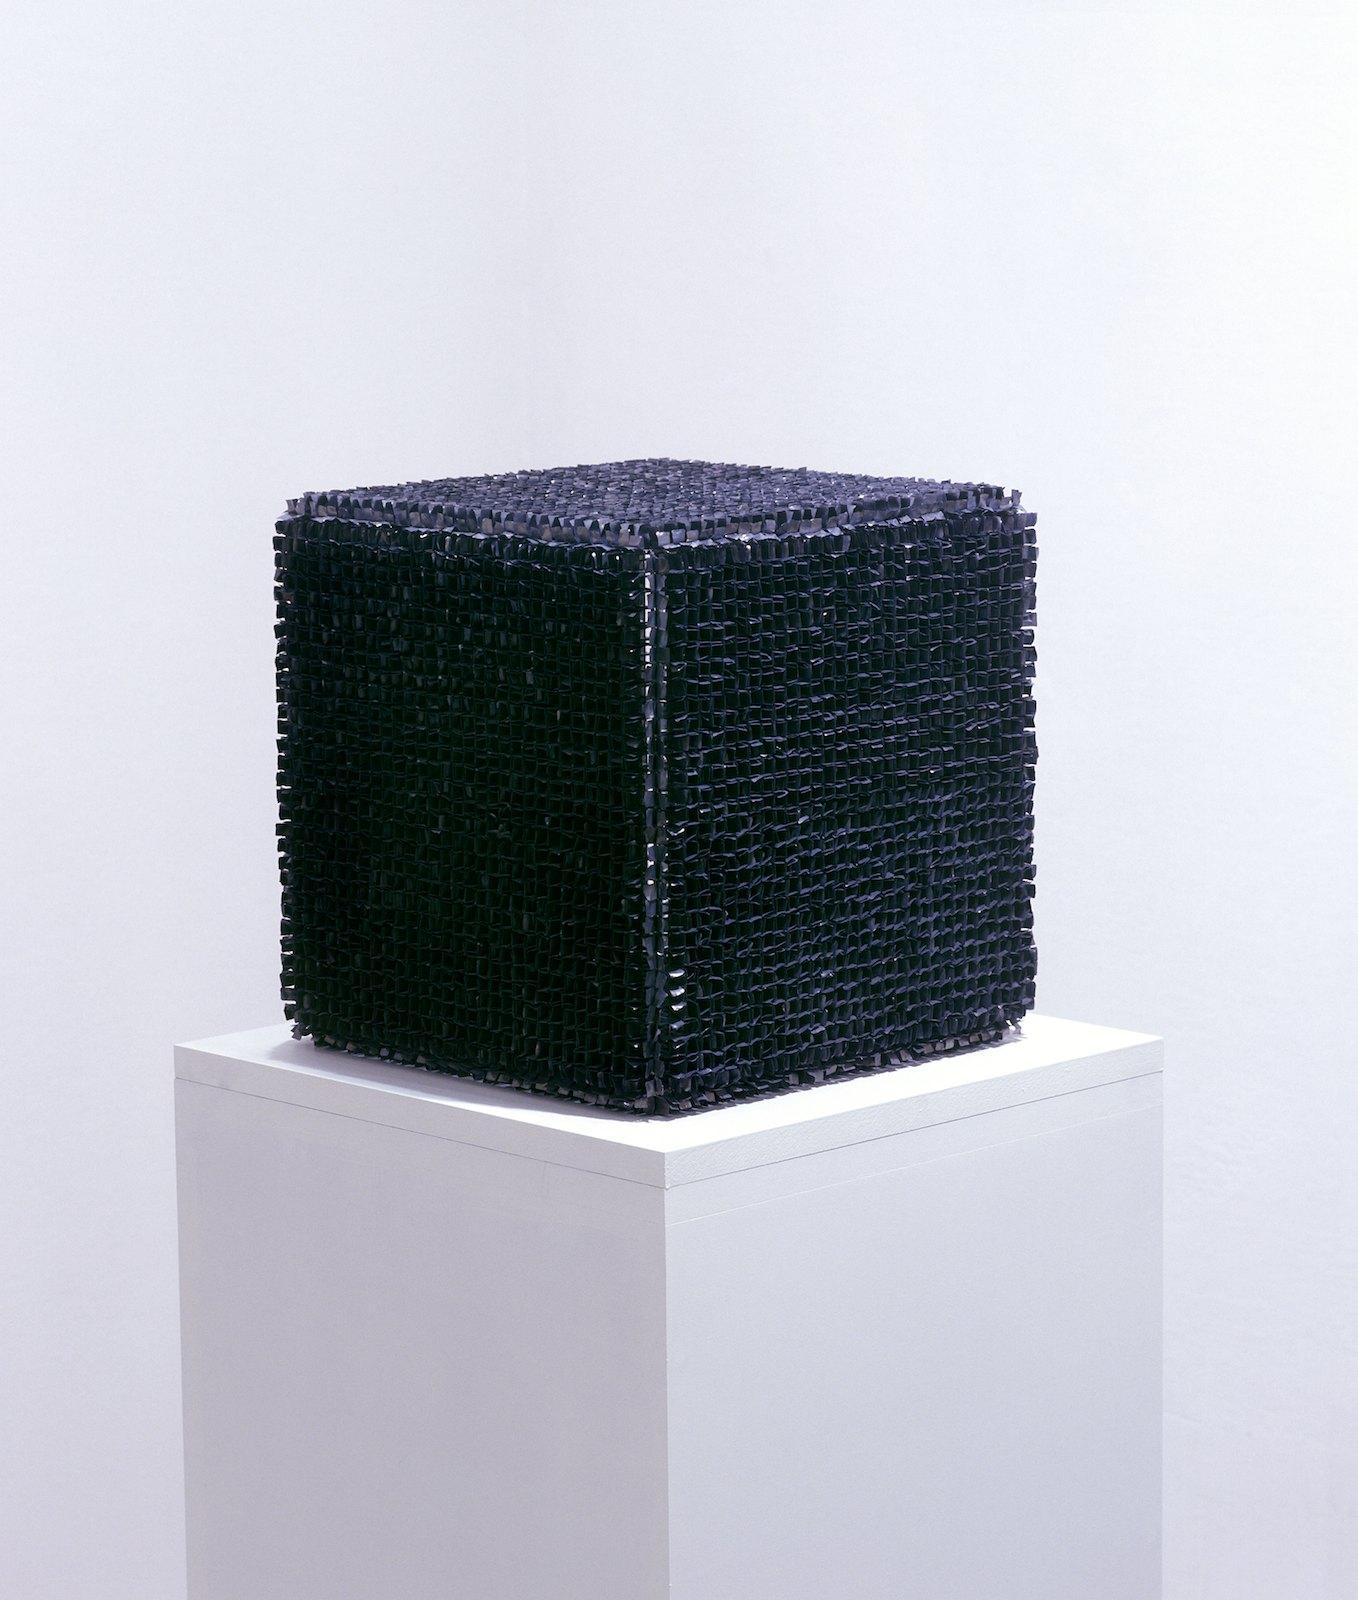 Sculpture V, 2000, lead, steel, 36 x 36 x 36 cm